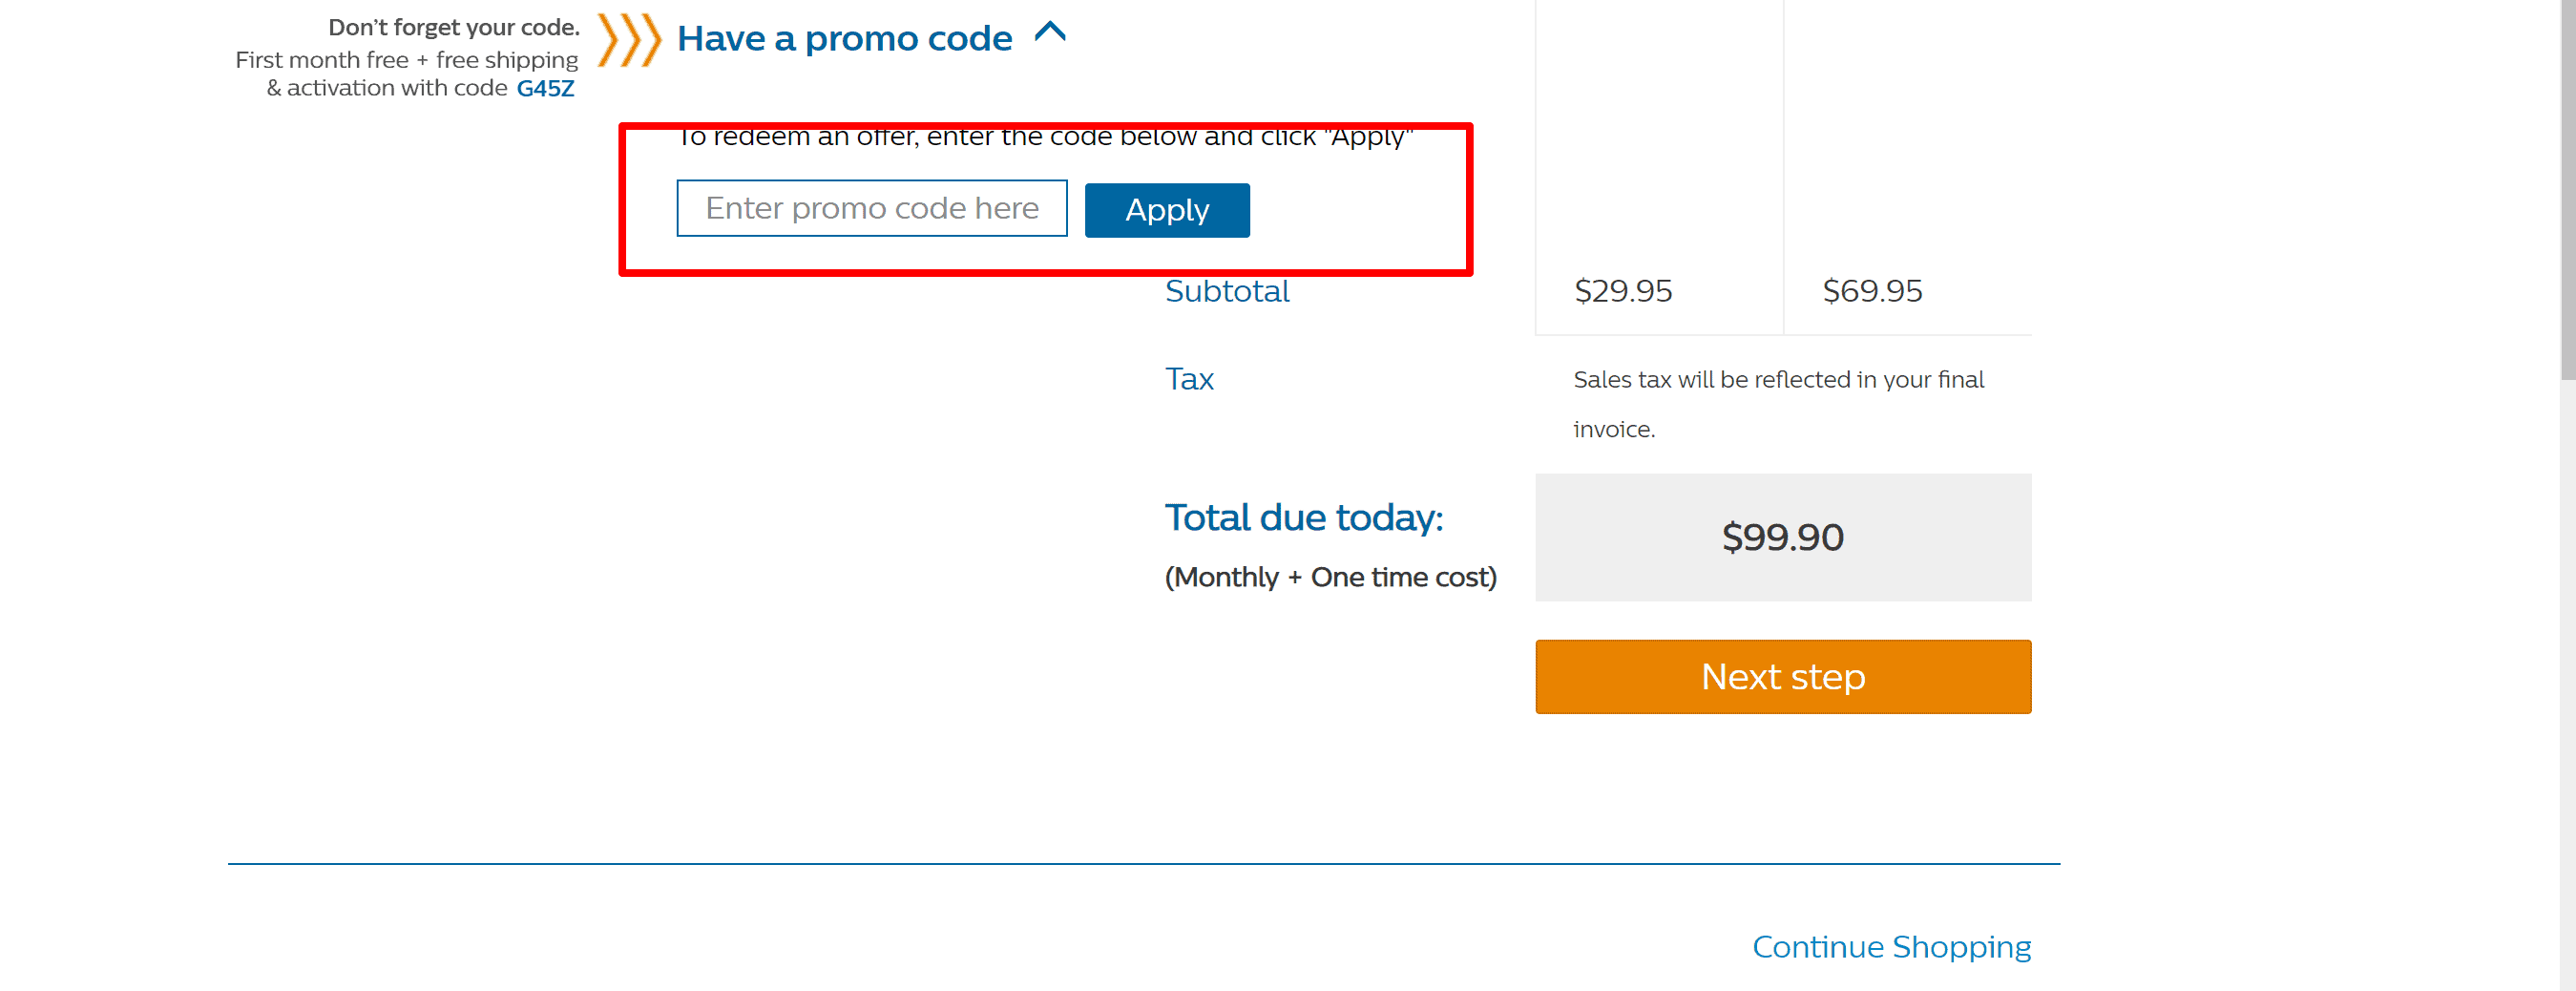 Philips Lifeline coupon codes